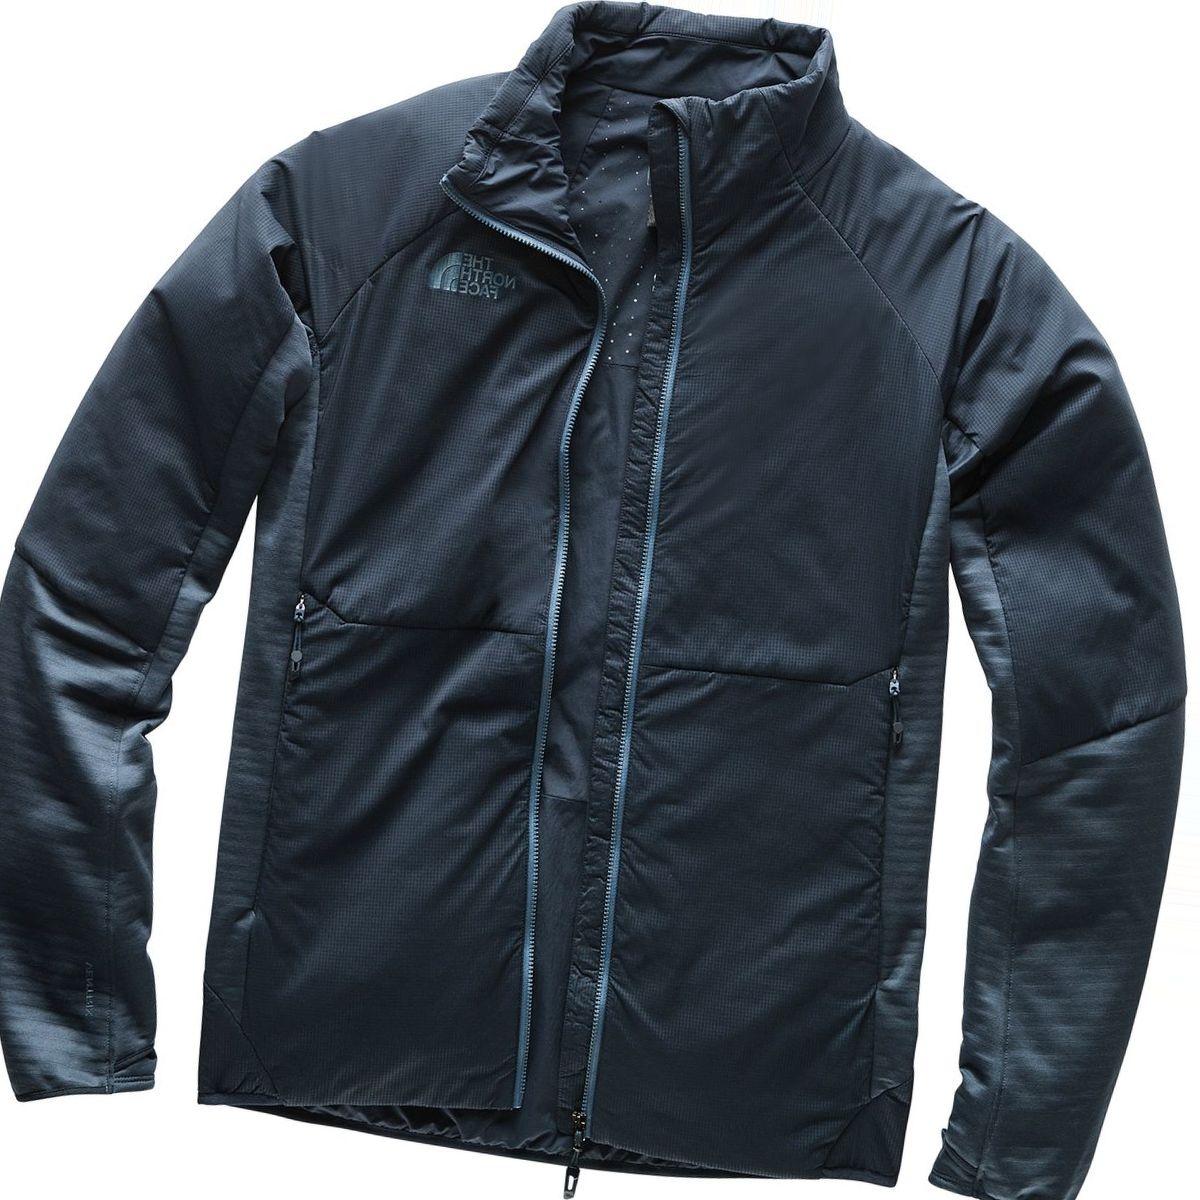 The North Face Ventrix Light Fleece Hybrid Jacket - Men's